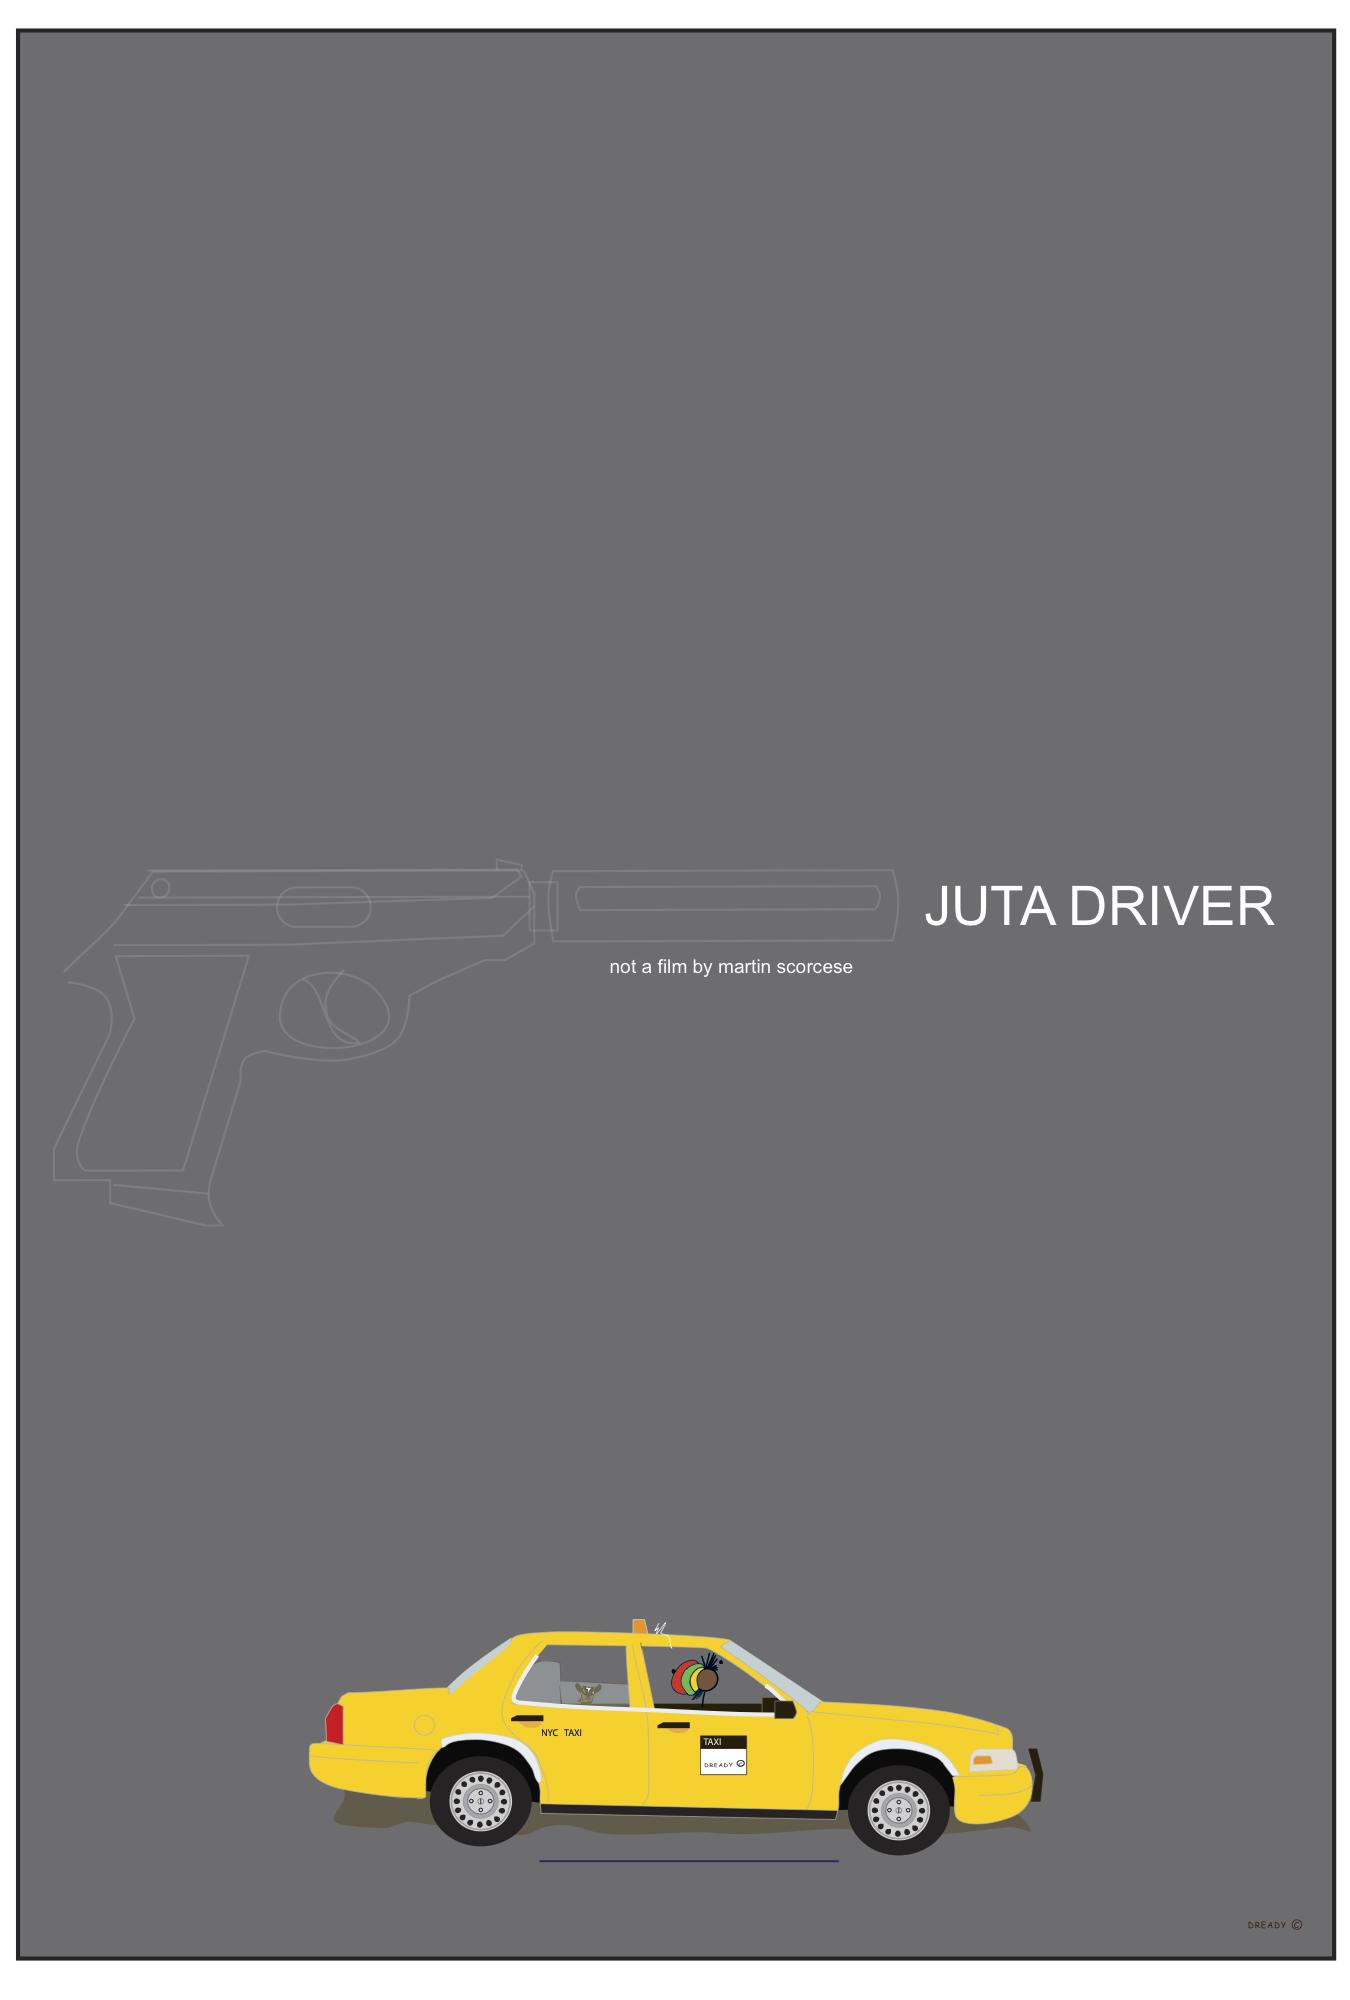 Juta Driver